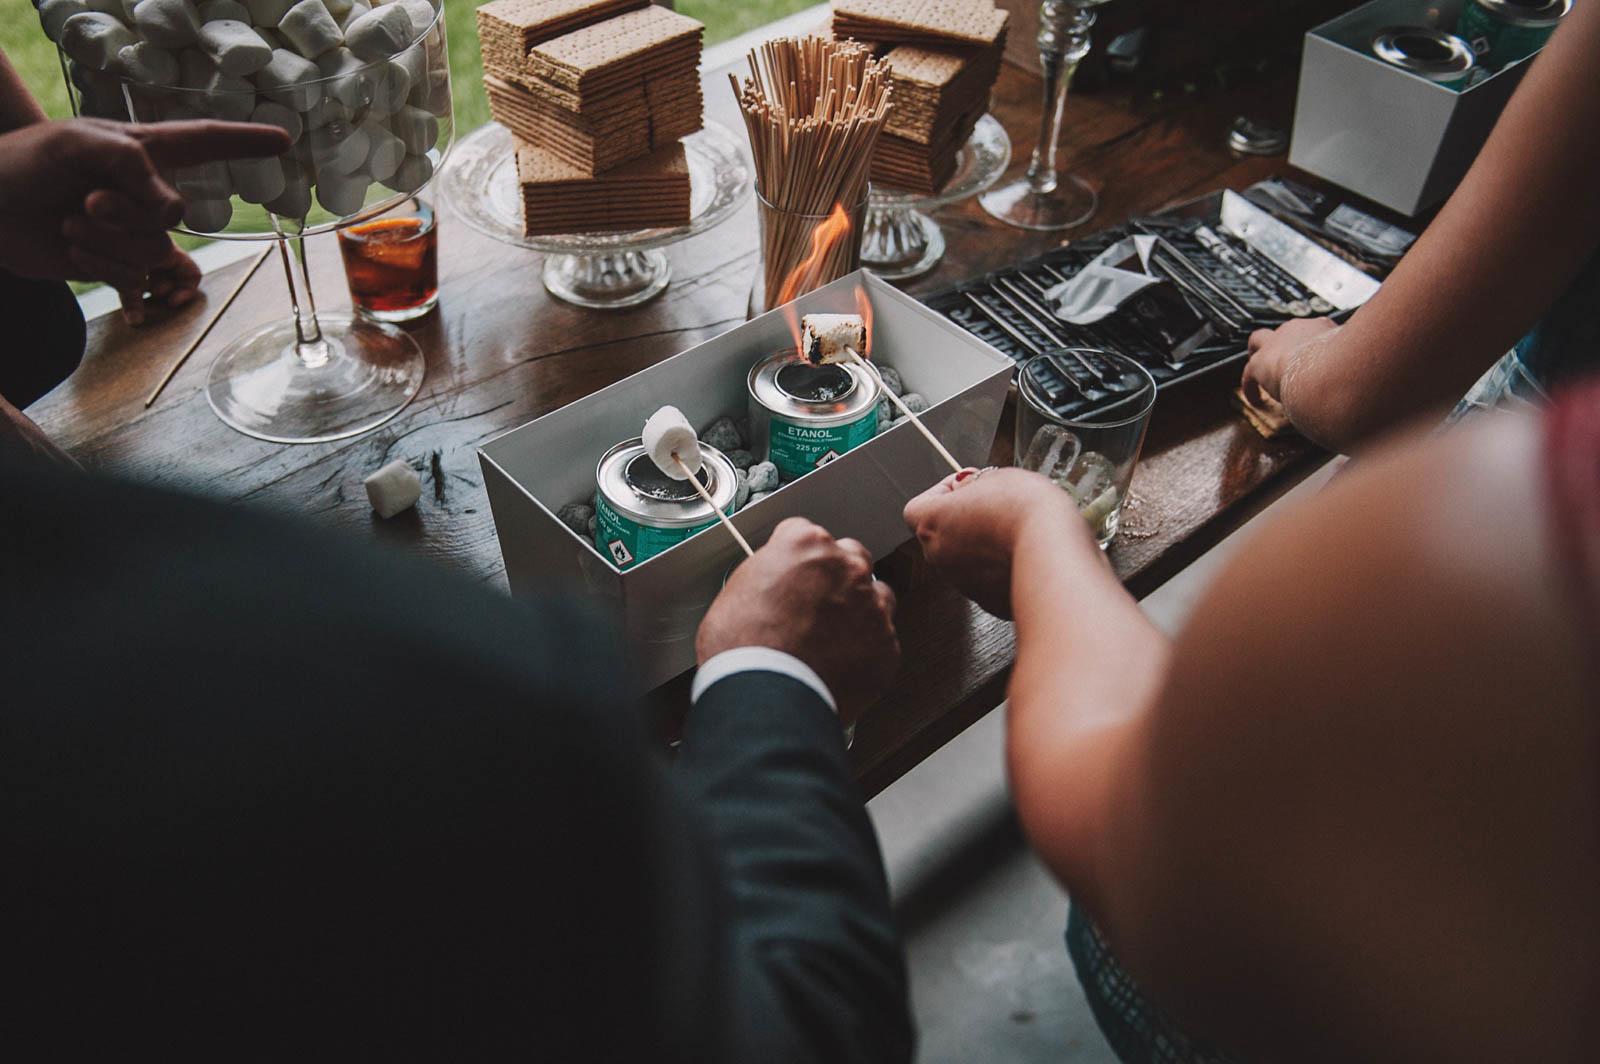 Smores Bar organizada por Conmemora Wedding Planner en el restaurante Aboiz, Garai